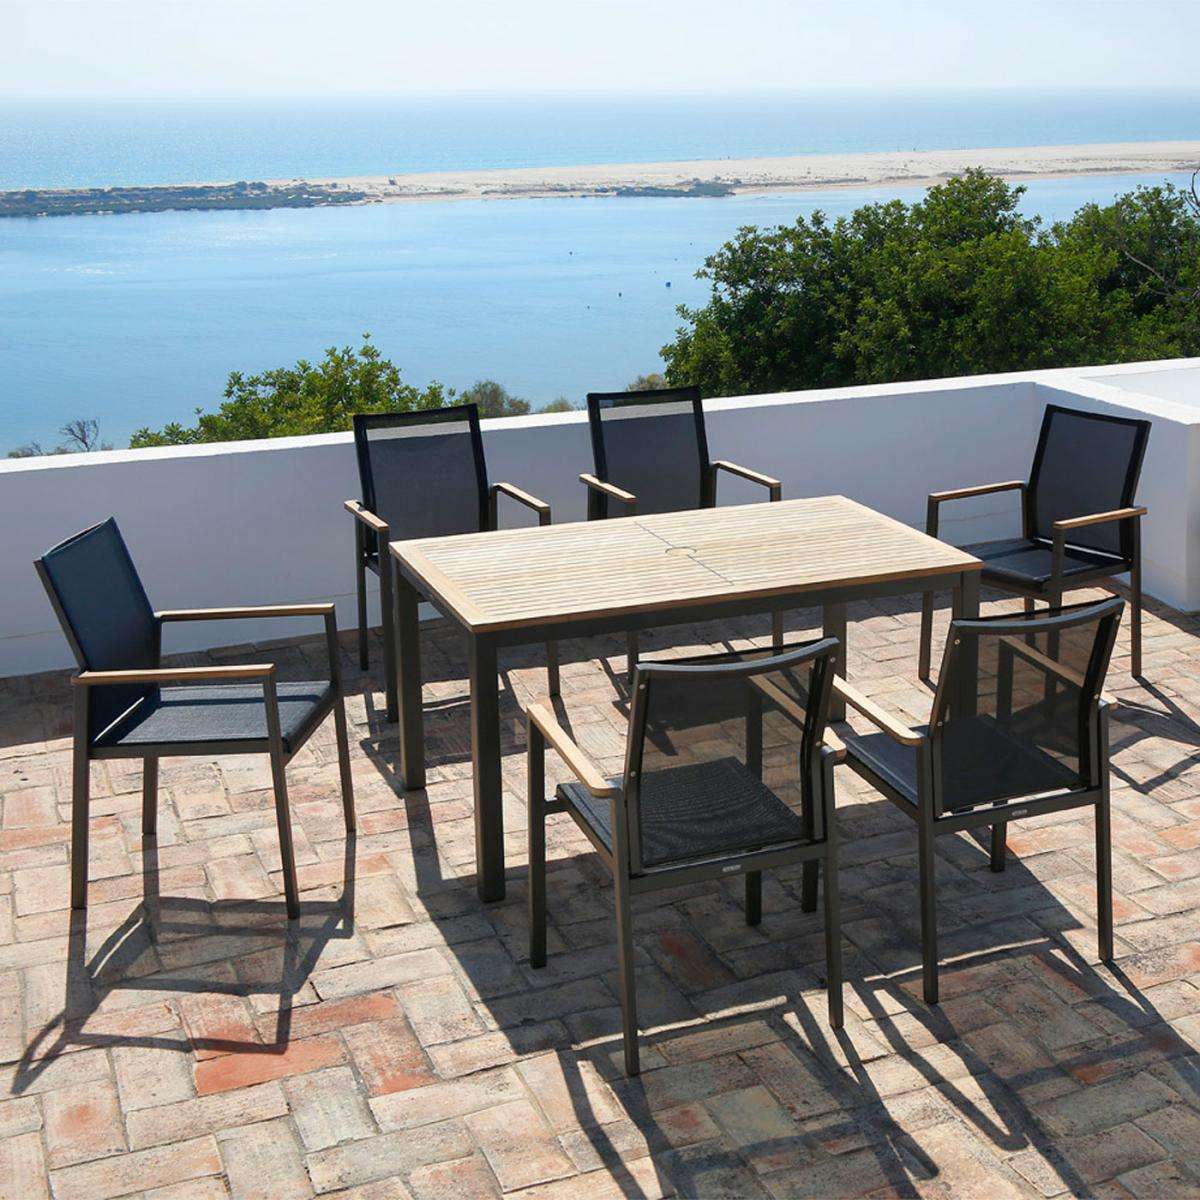 Barlow Tyrie Aura Six Seater Dining Set